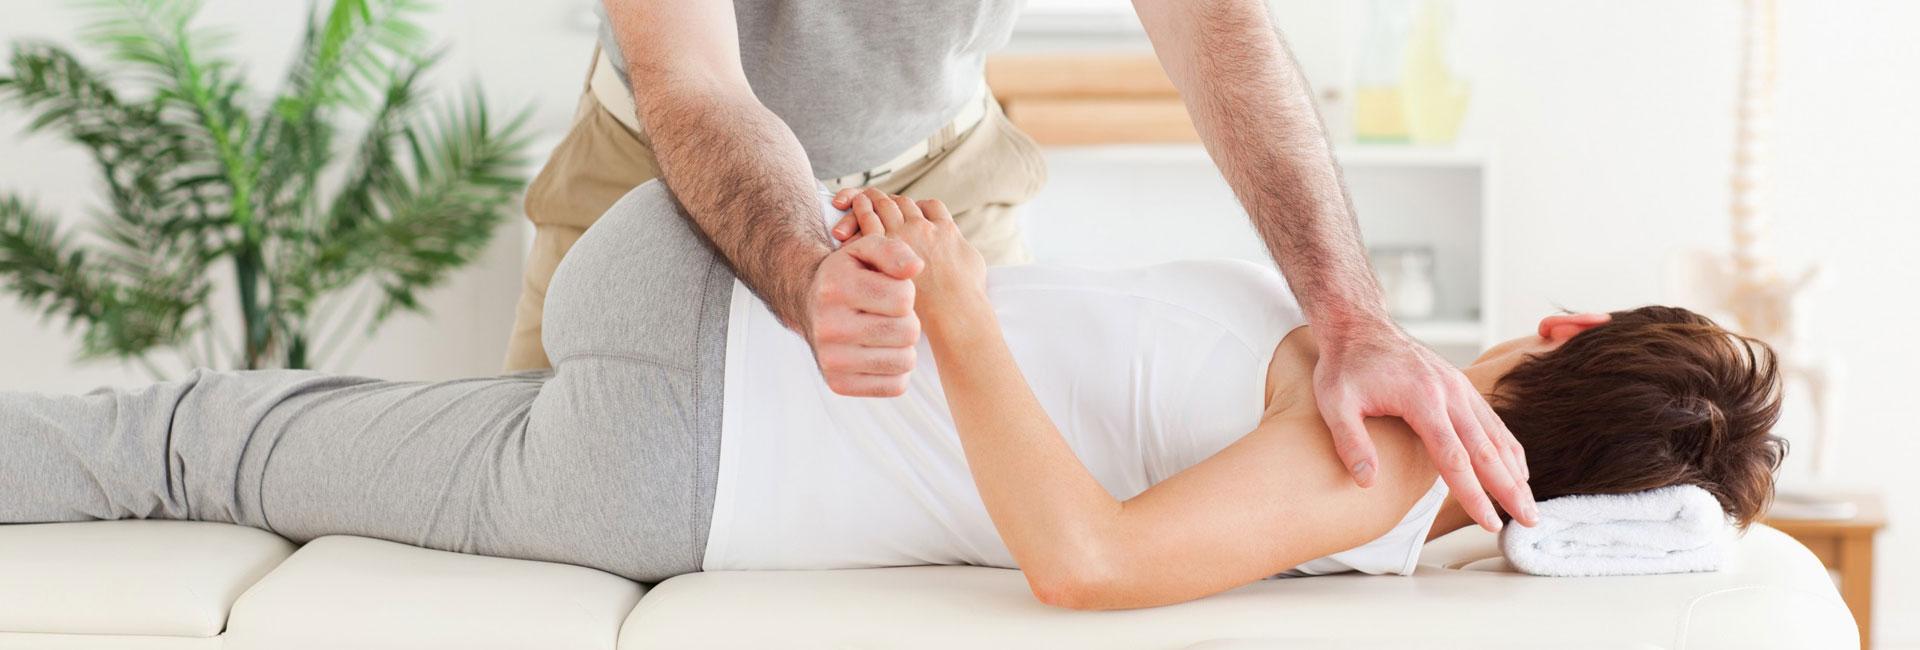 chiropraticien-montreal